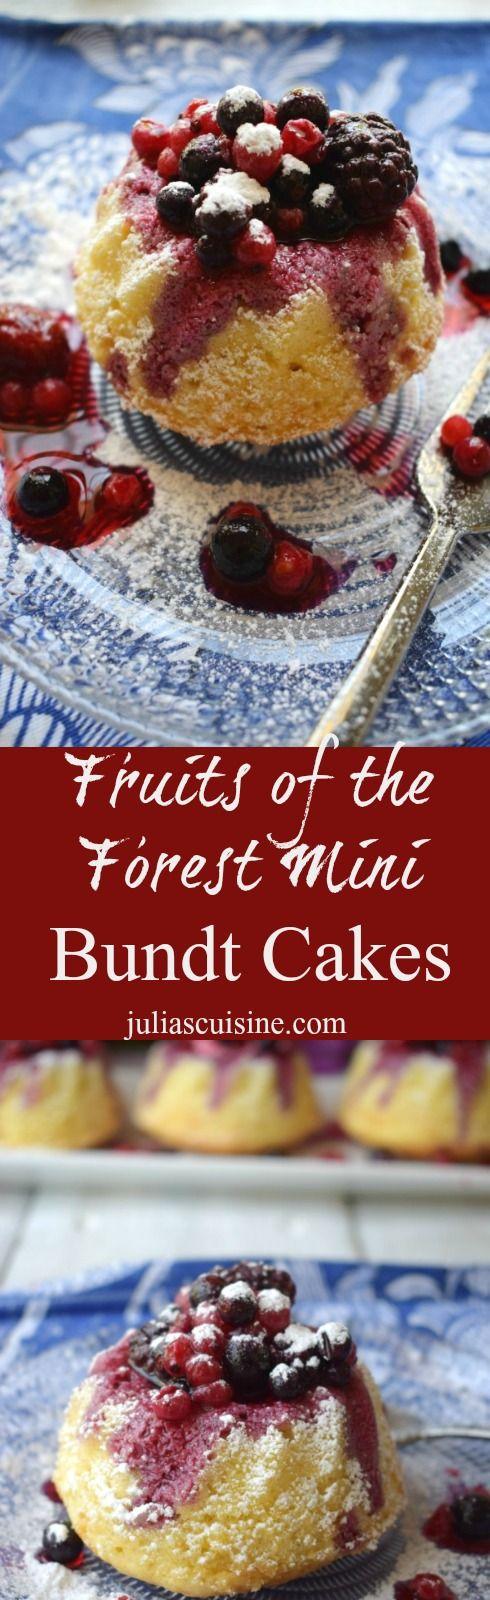 Fruits of the Forest Mini Bundt Cakes  http://www.juliascuisine.com/home/fruits-of-the-forest-mini-bundt-cakes